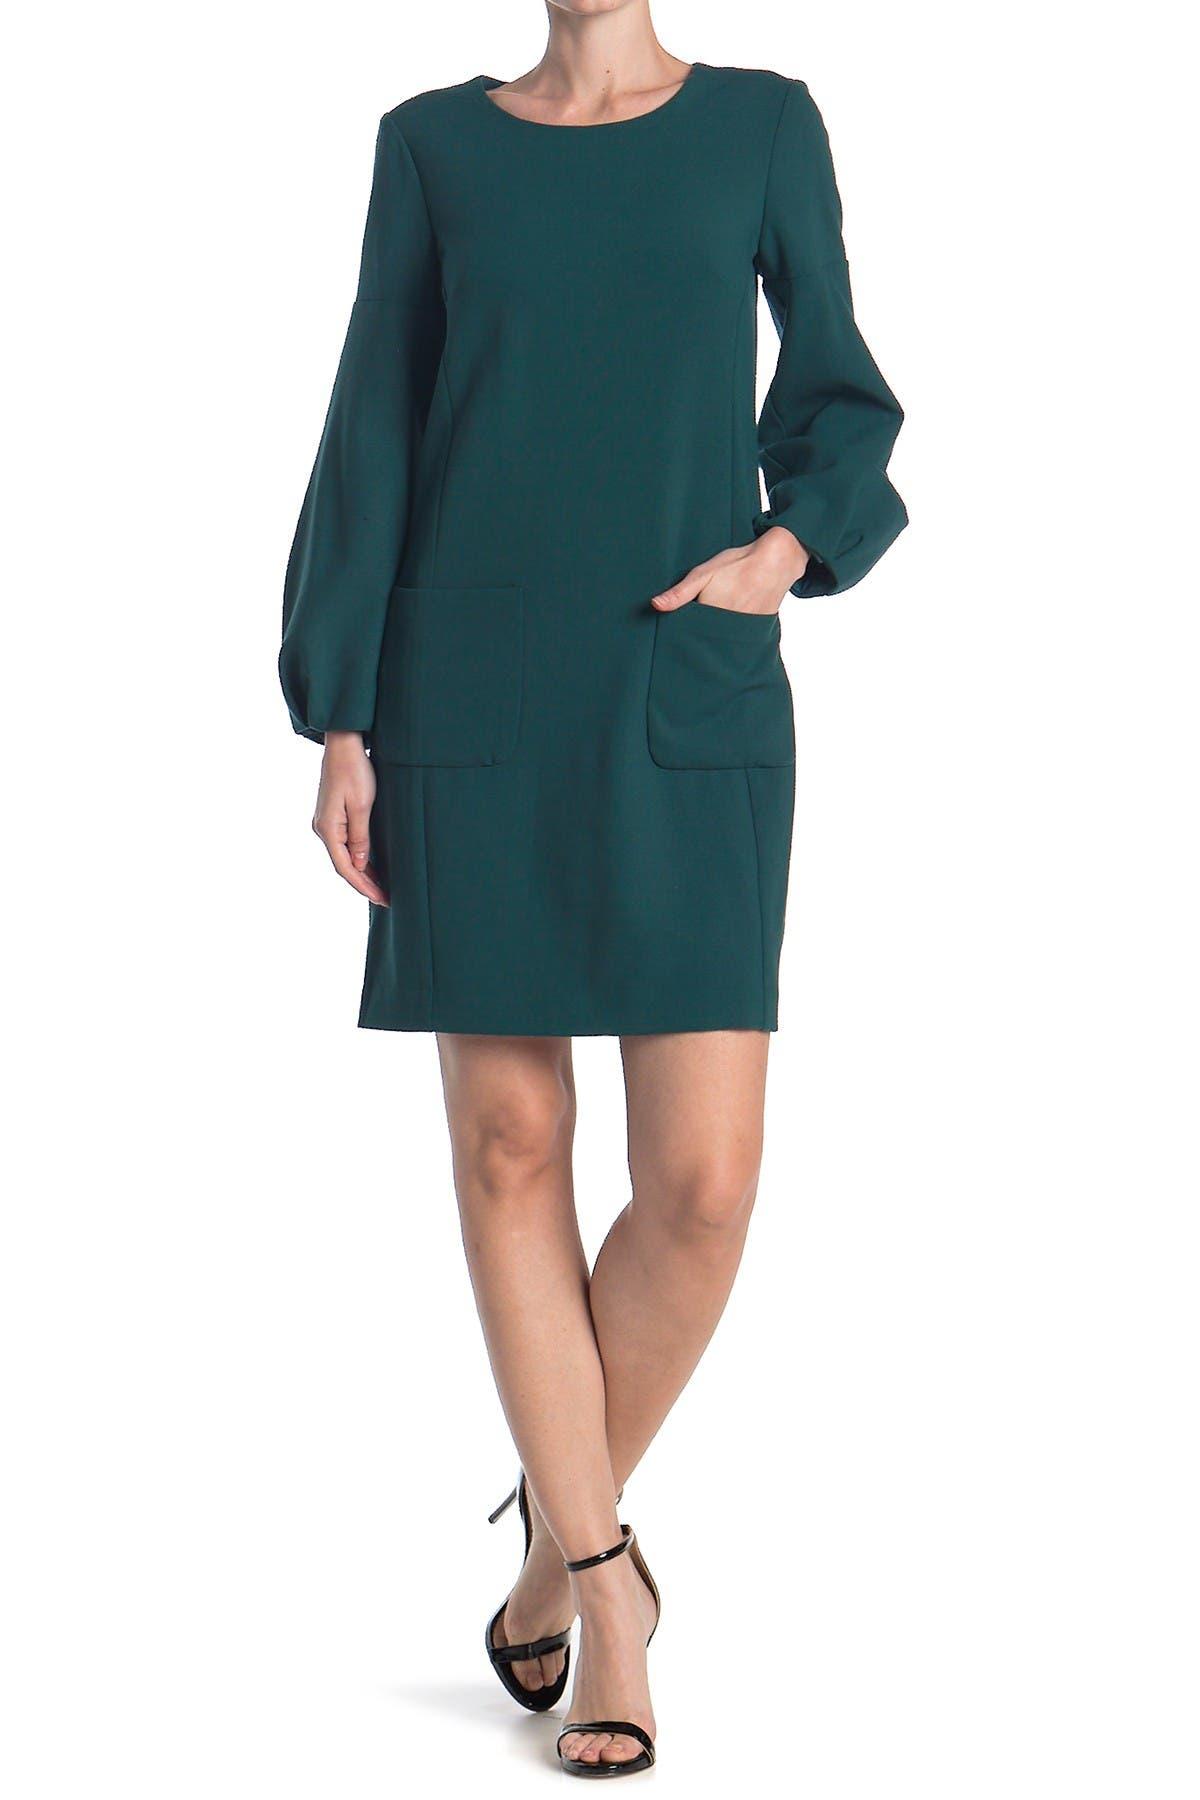 Image of Trina Turk Makiko Pocket Dress